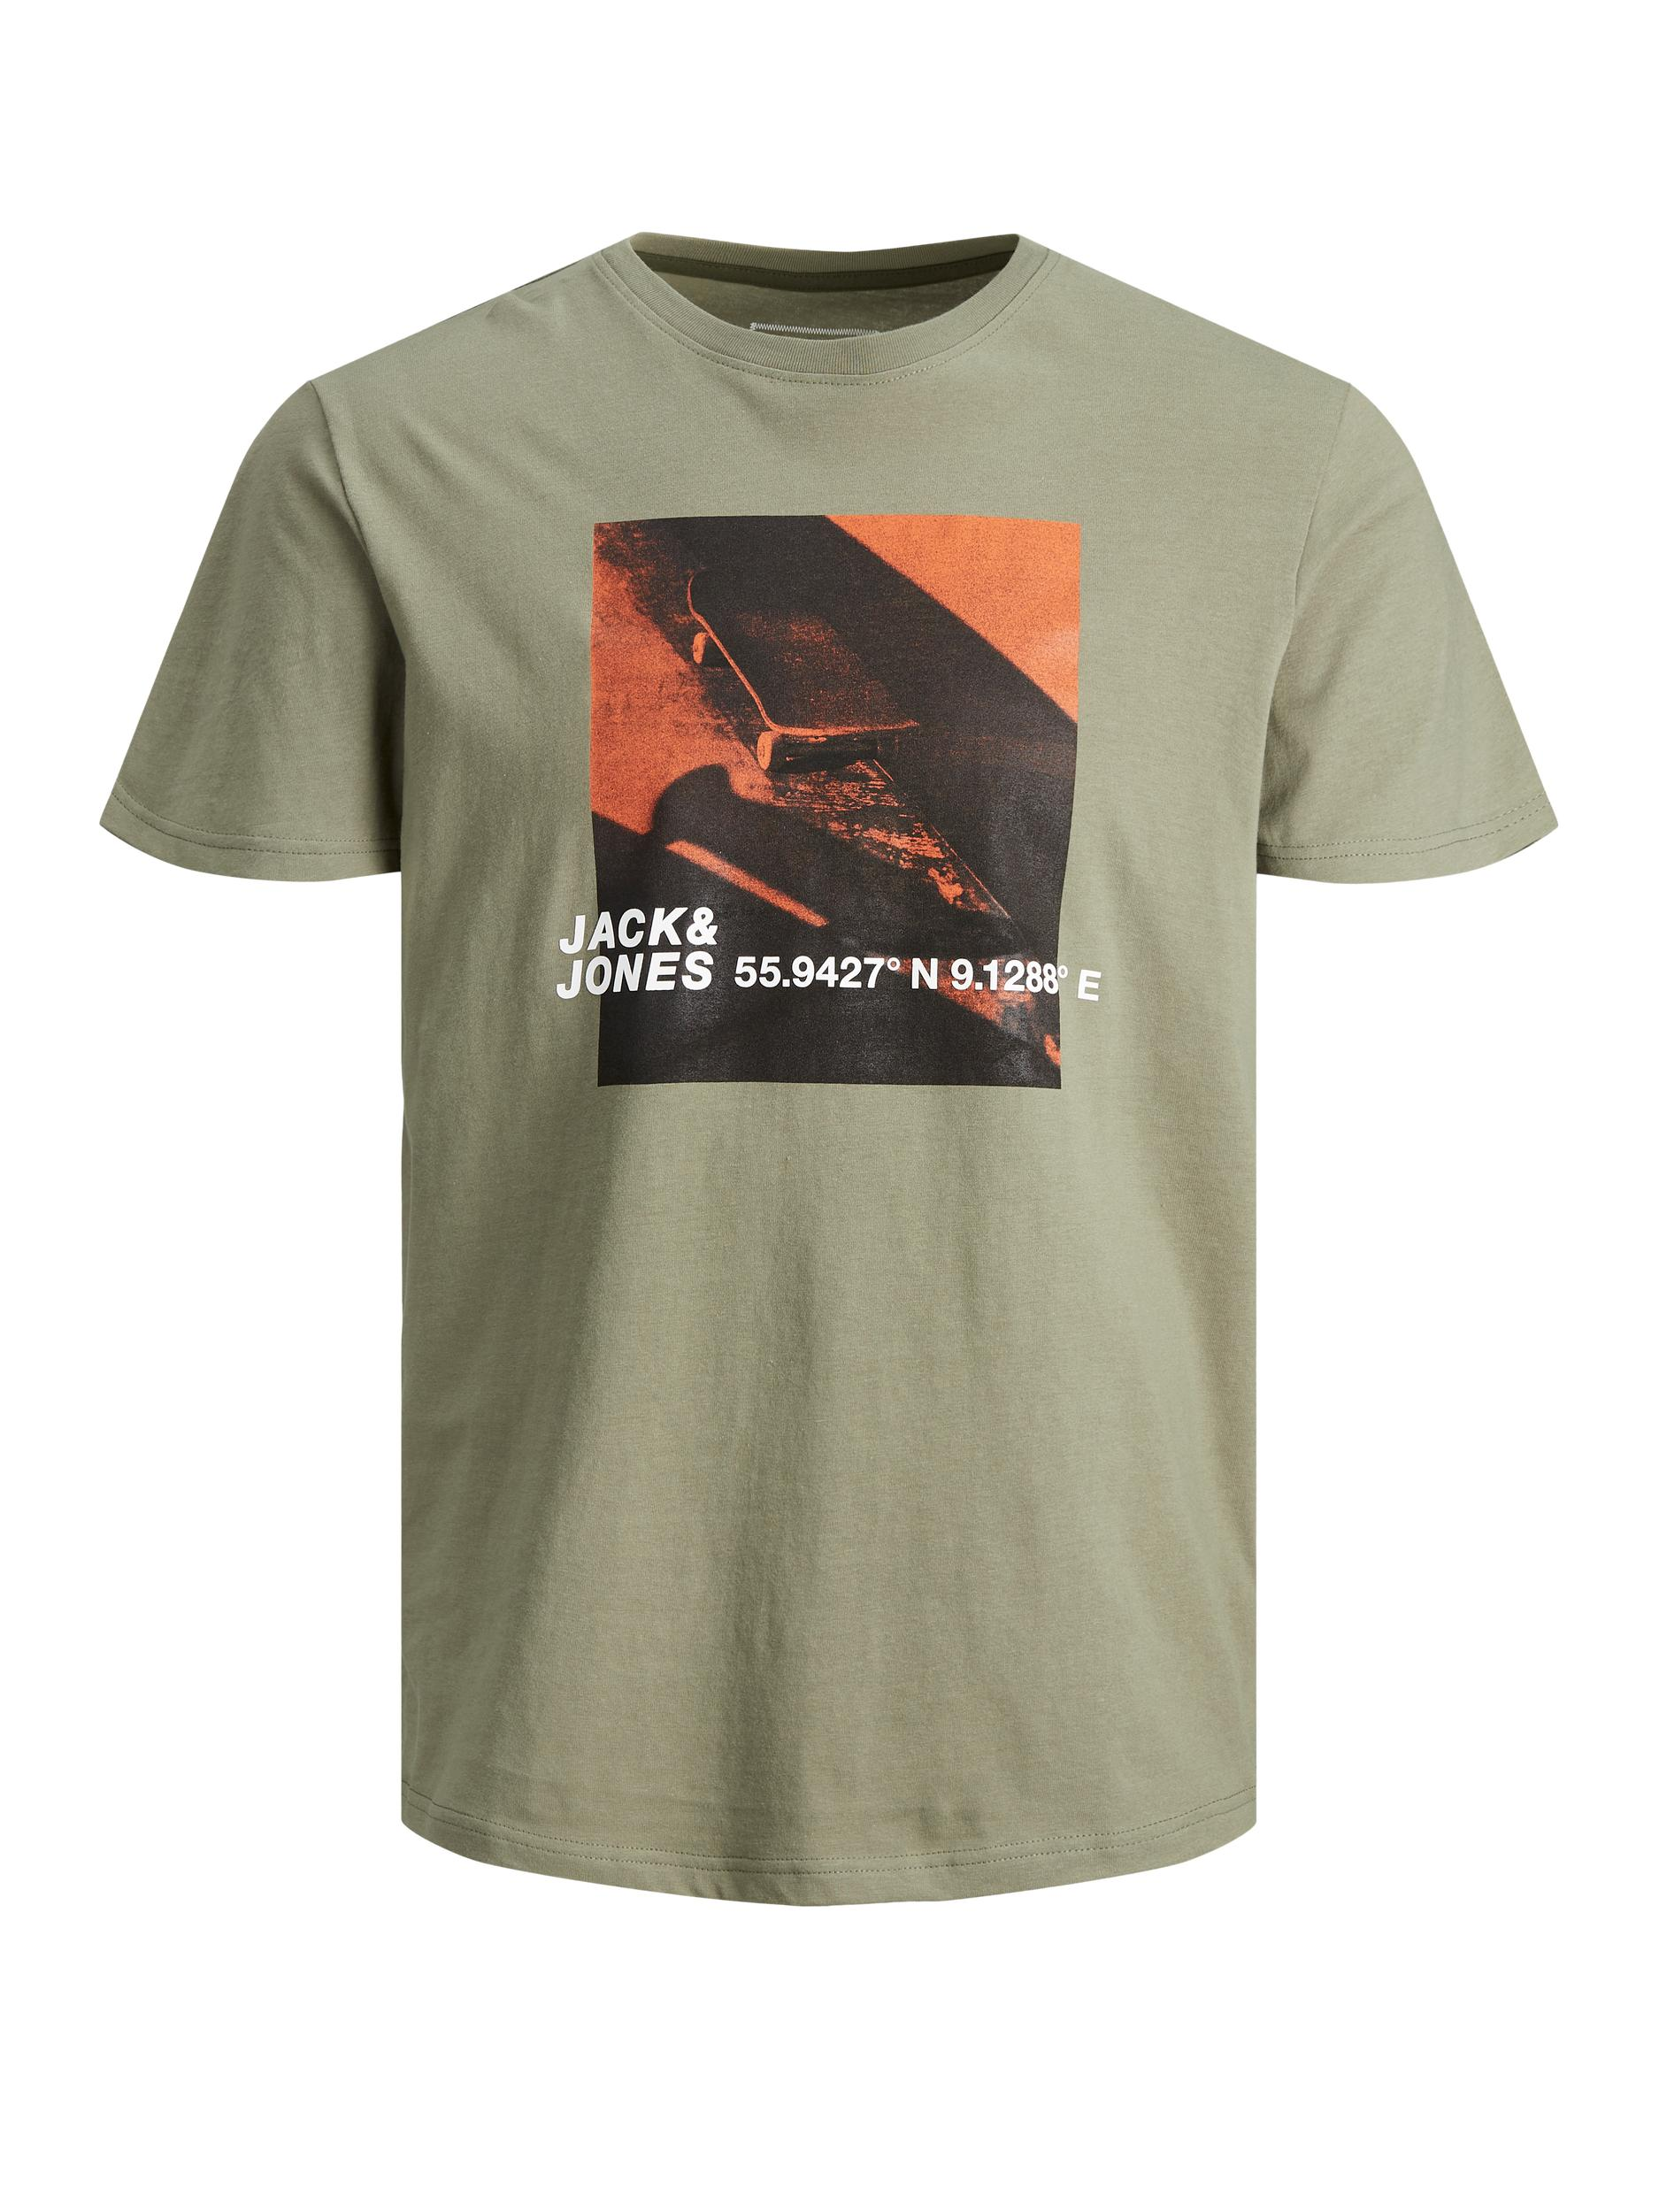 Cojump Tee Crew neck plus JACK&JONES   T-shirt   12186571DEEP LICHEN GREEN